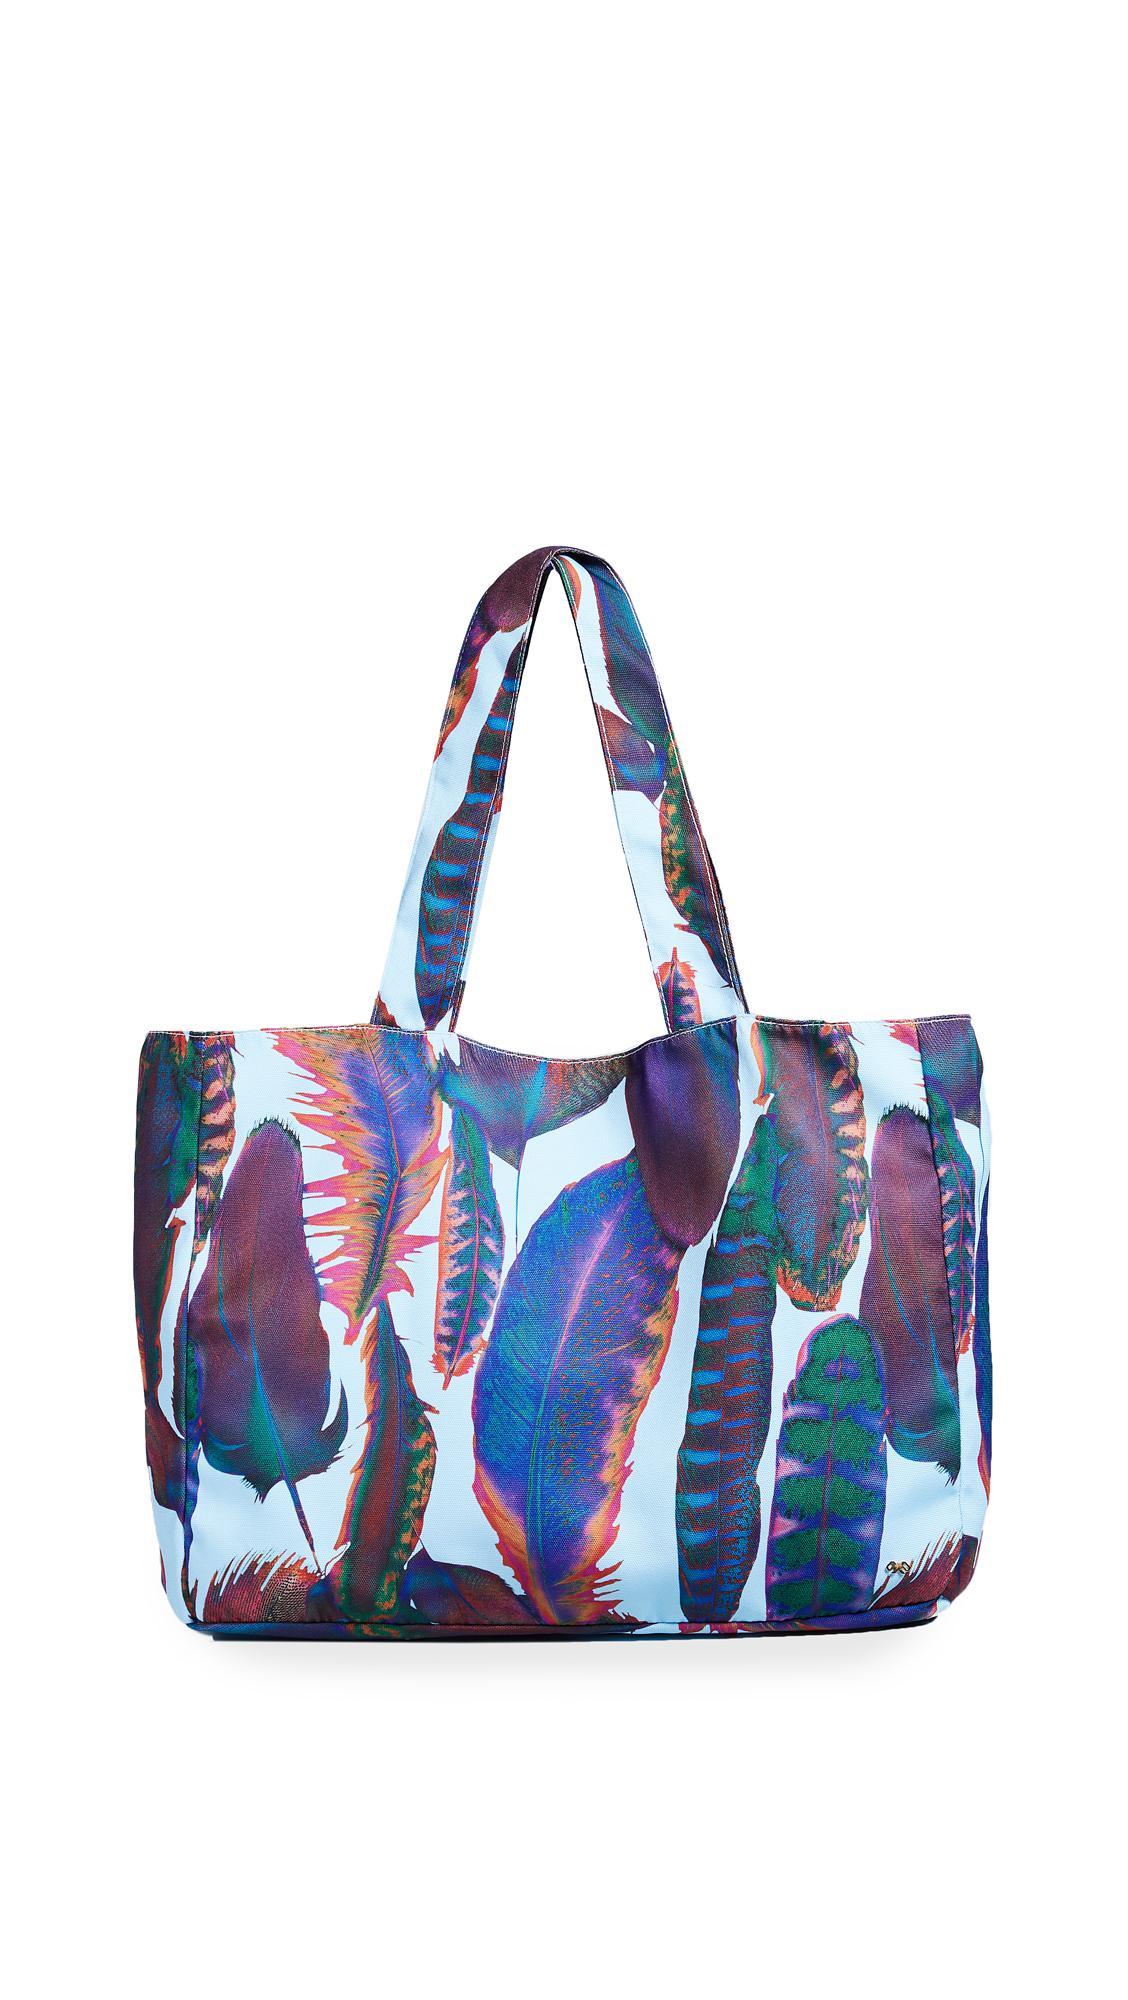 VIDA Tote Bag - Iris Love by VIDA eF37Td